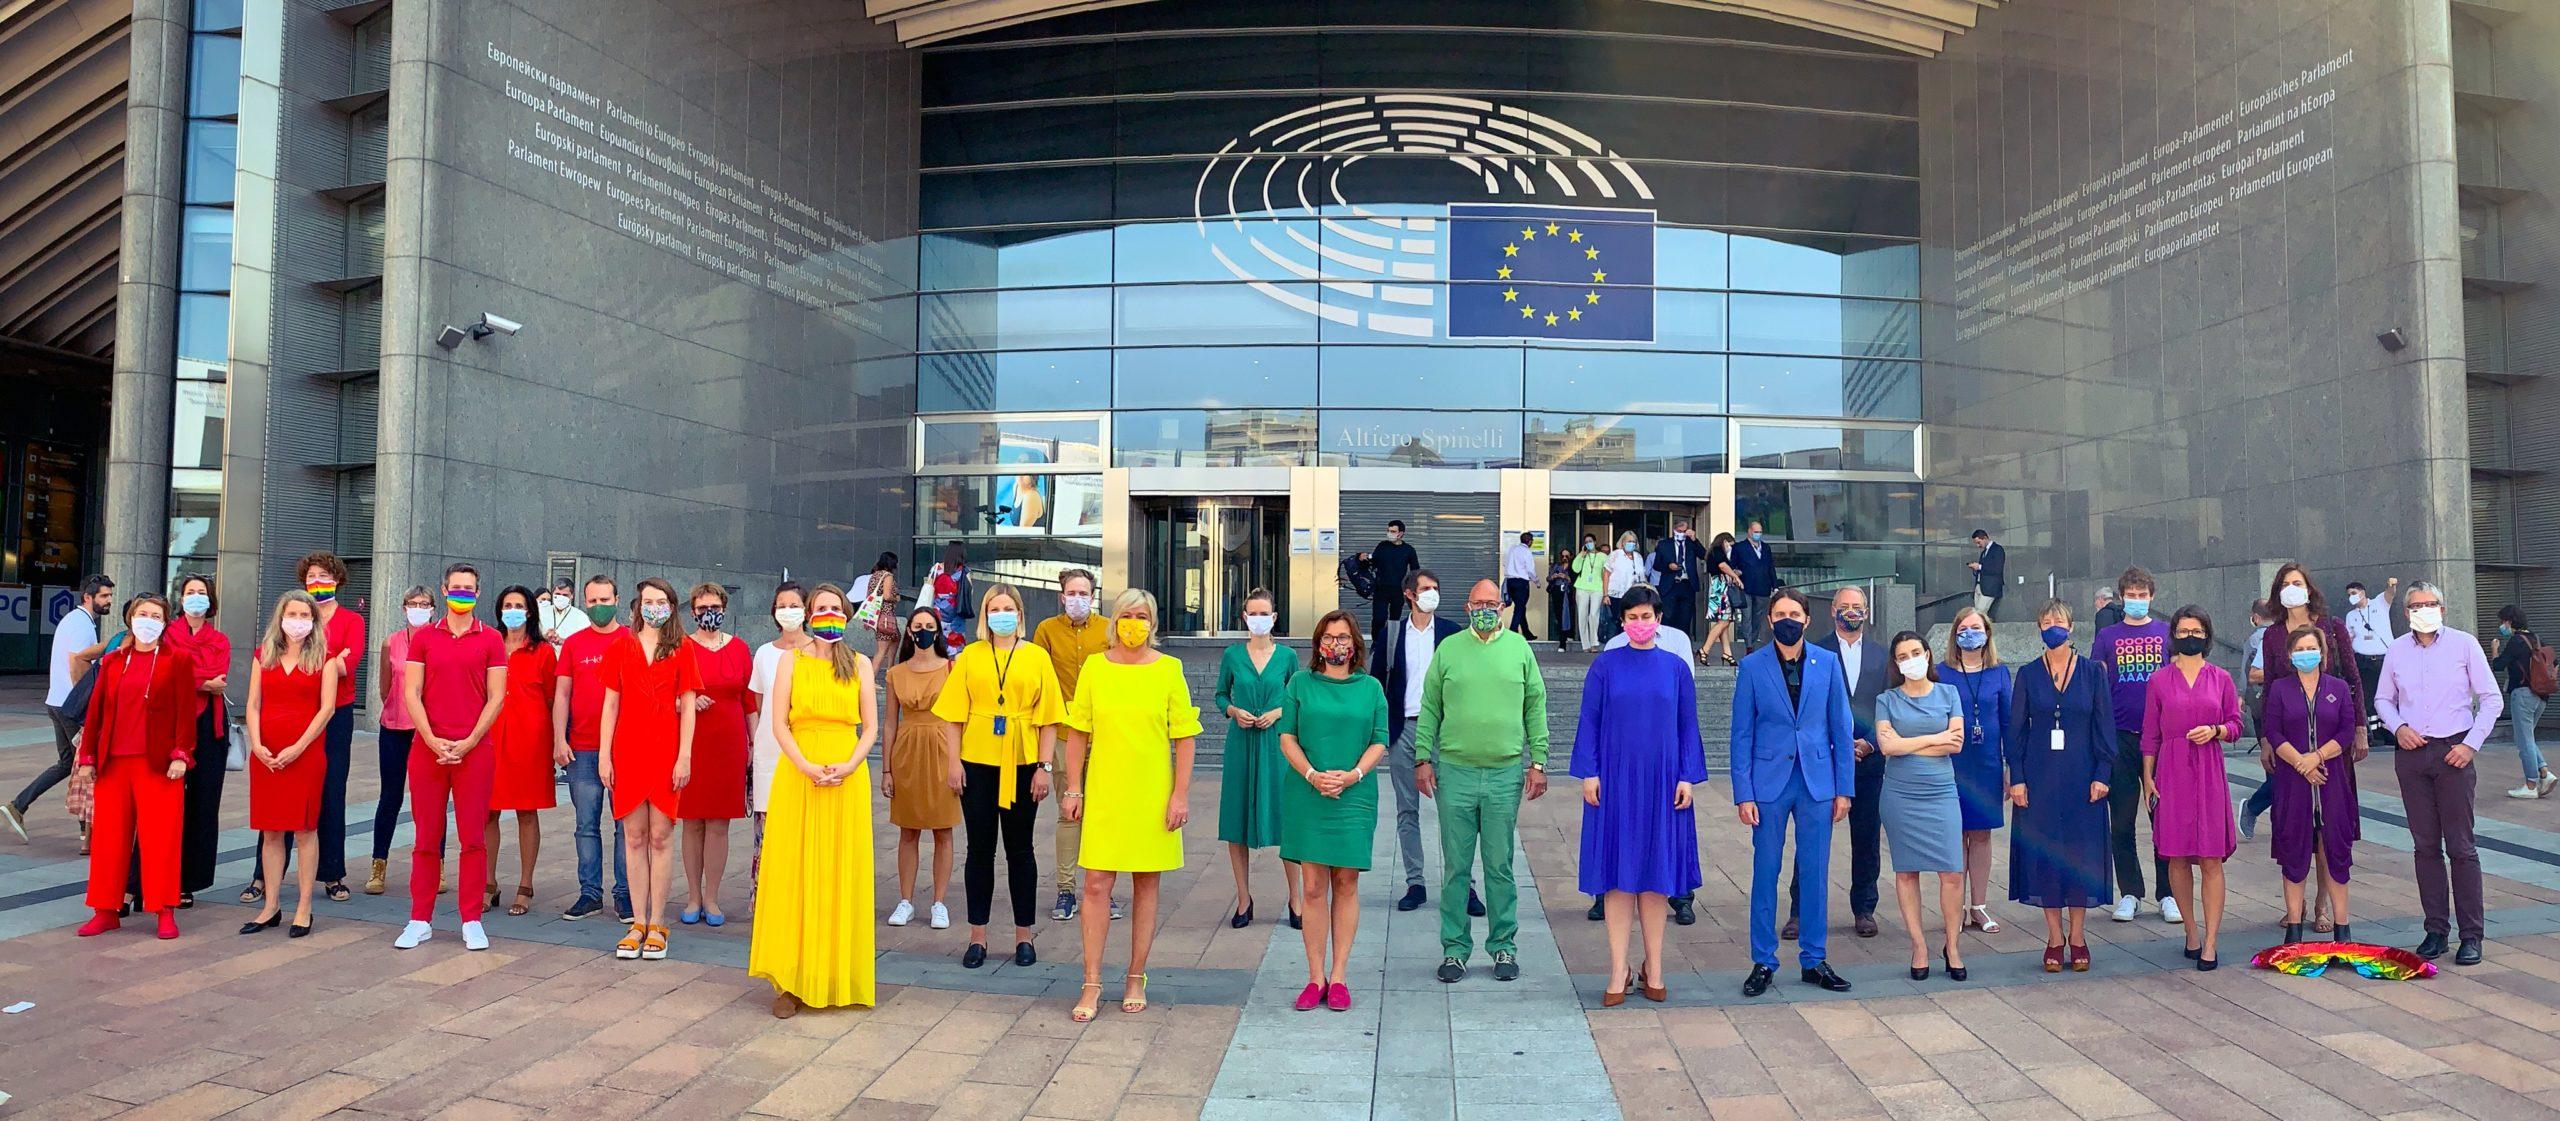 Parlament Europejski wspiera polską społeczność LGBTQ+